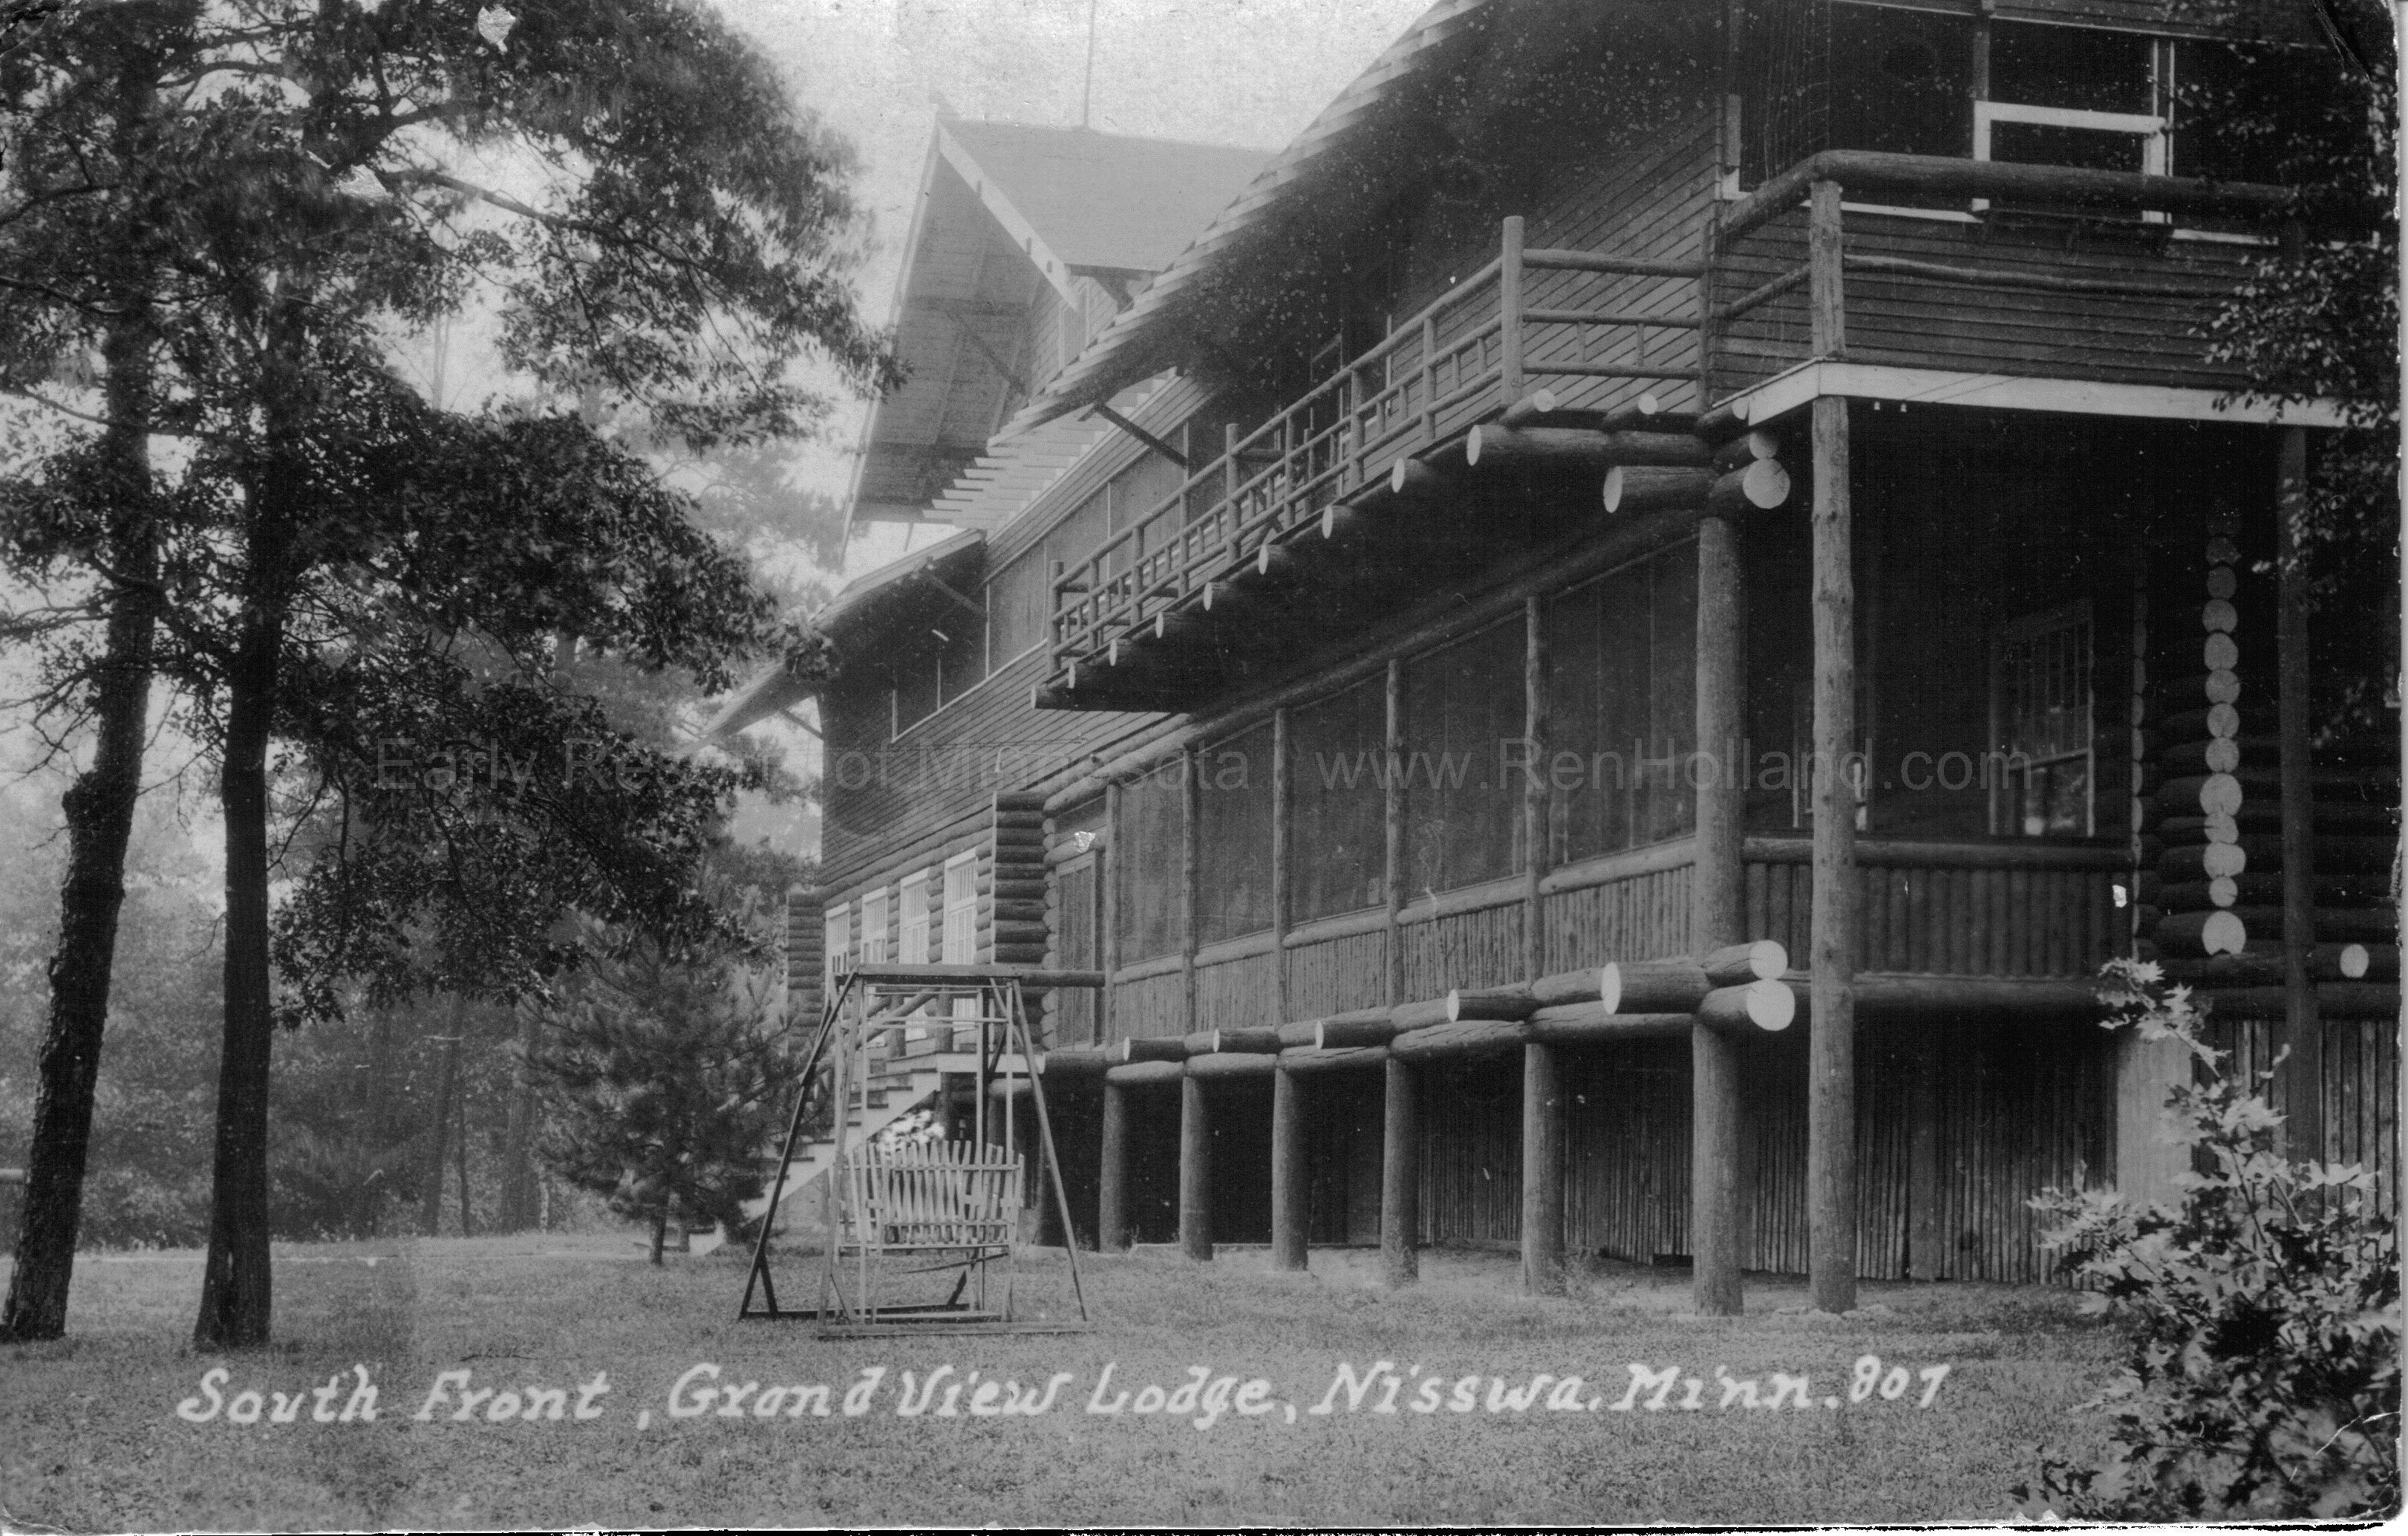 ... 3A Grand View Lodge, Gull Lake, Brainerd, Ca 1927 ...